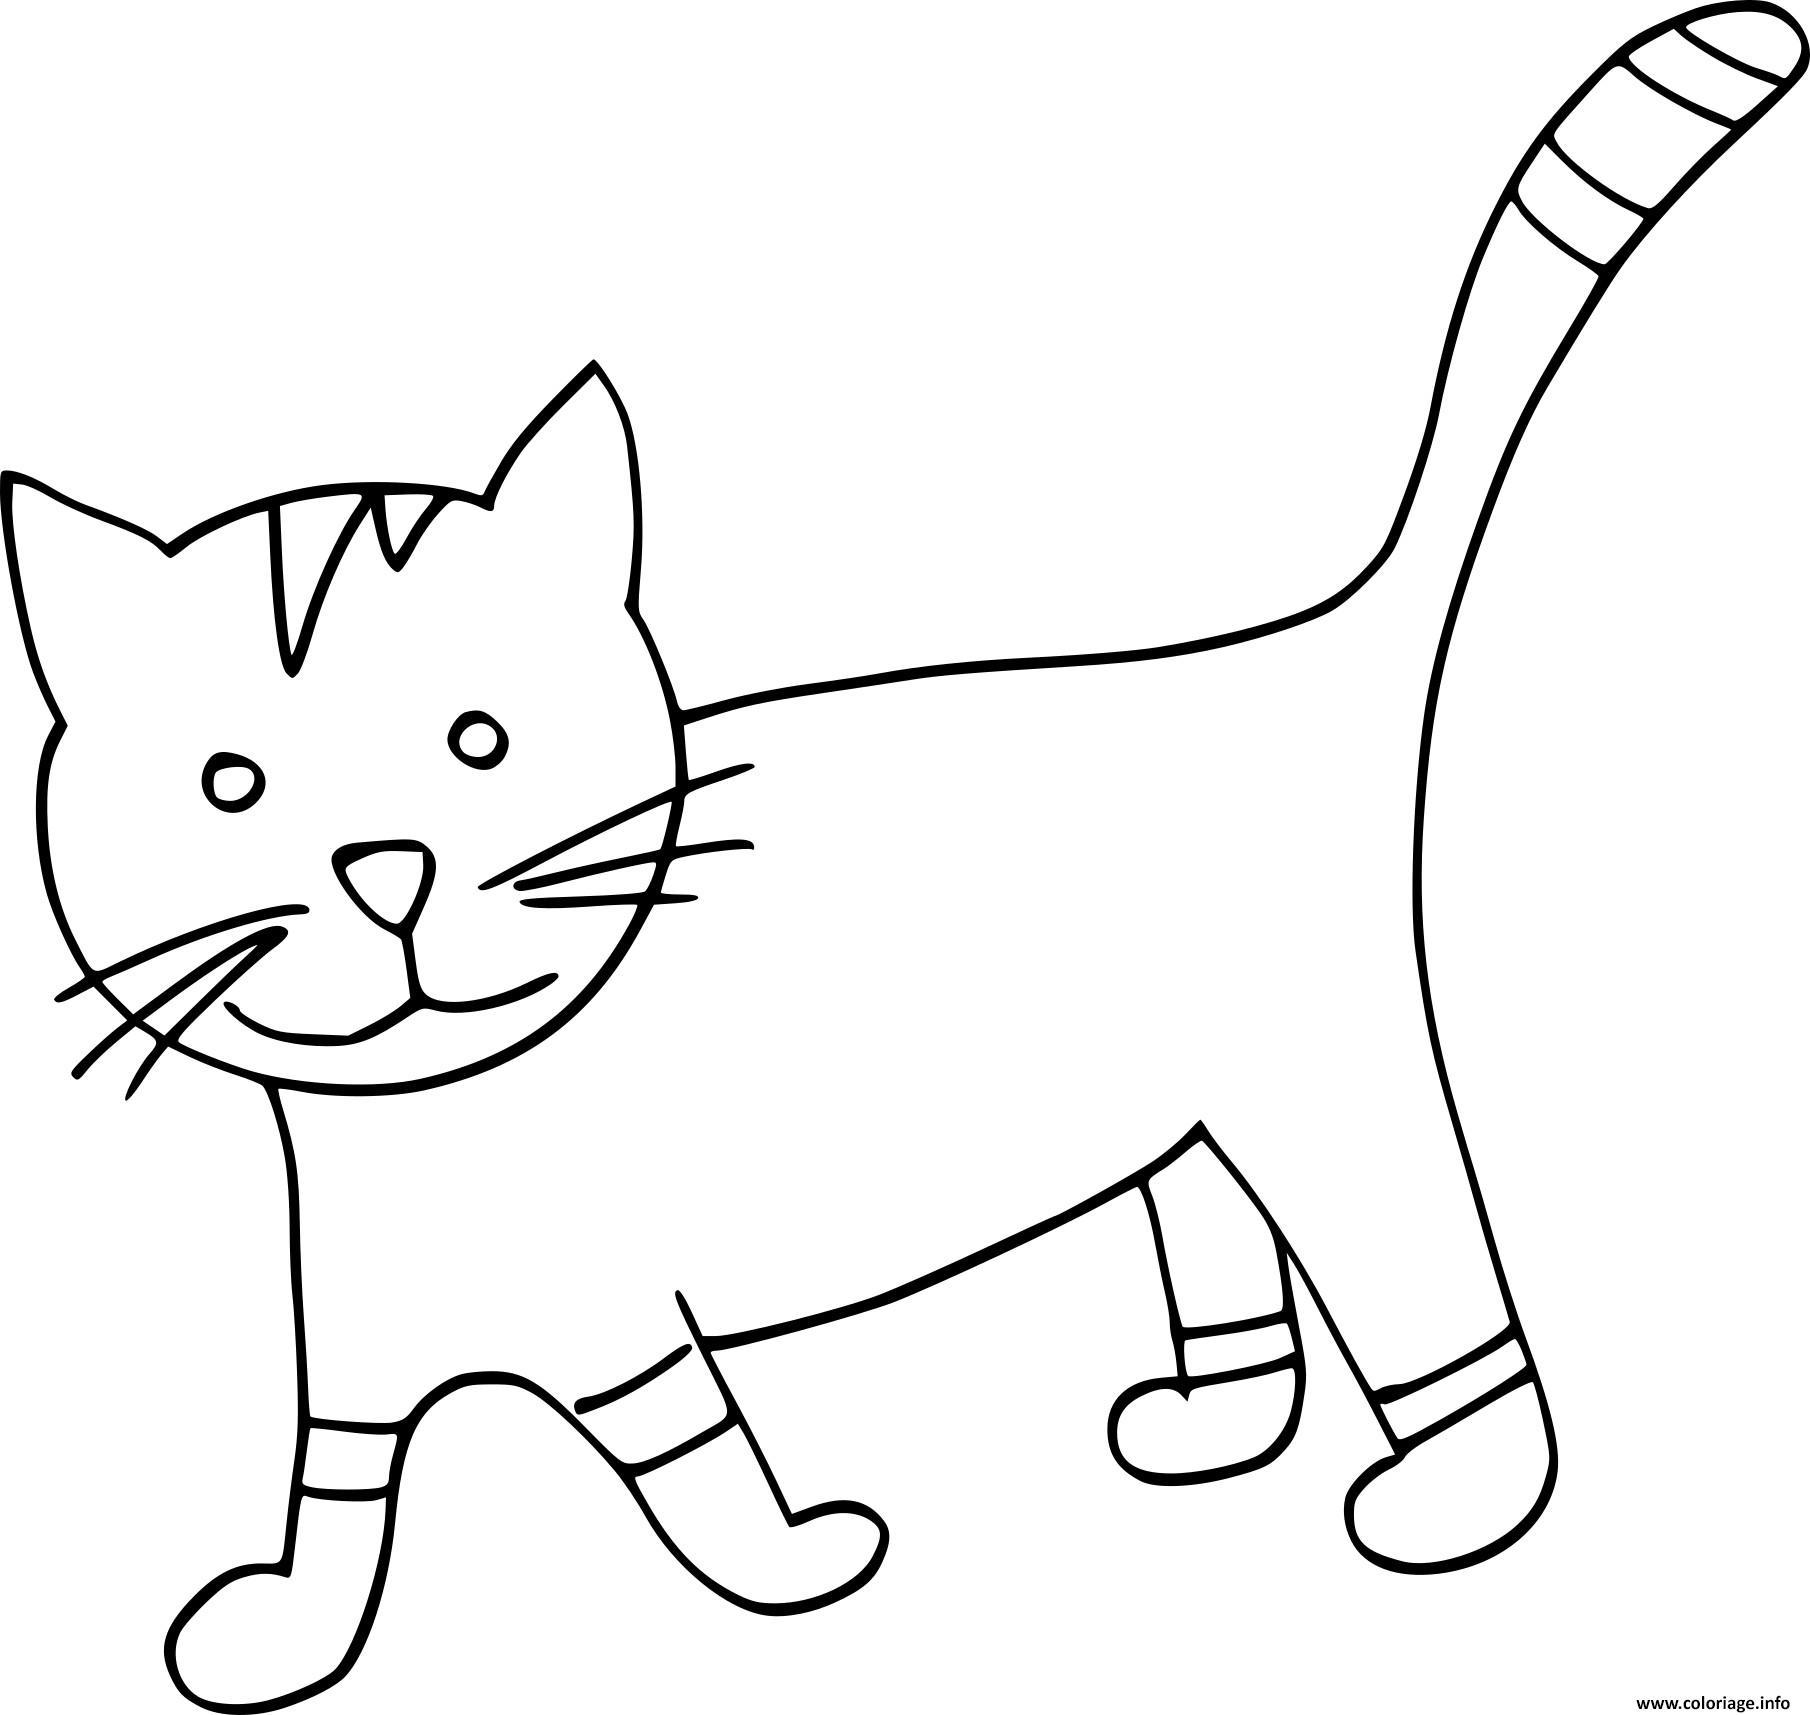 Coloriage dessin chat maternelle - Chat a colorier maternelle ...